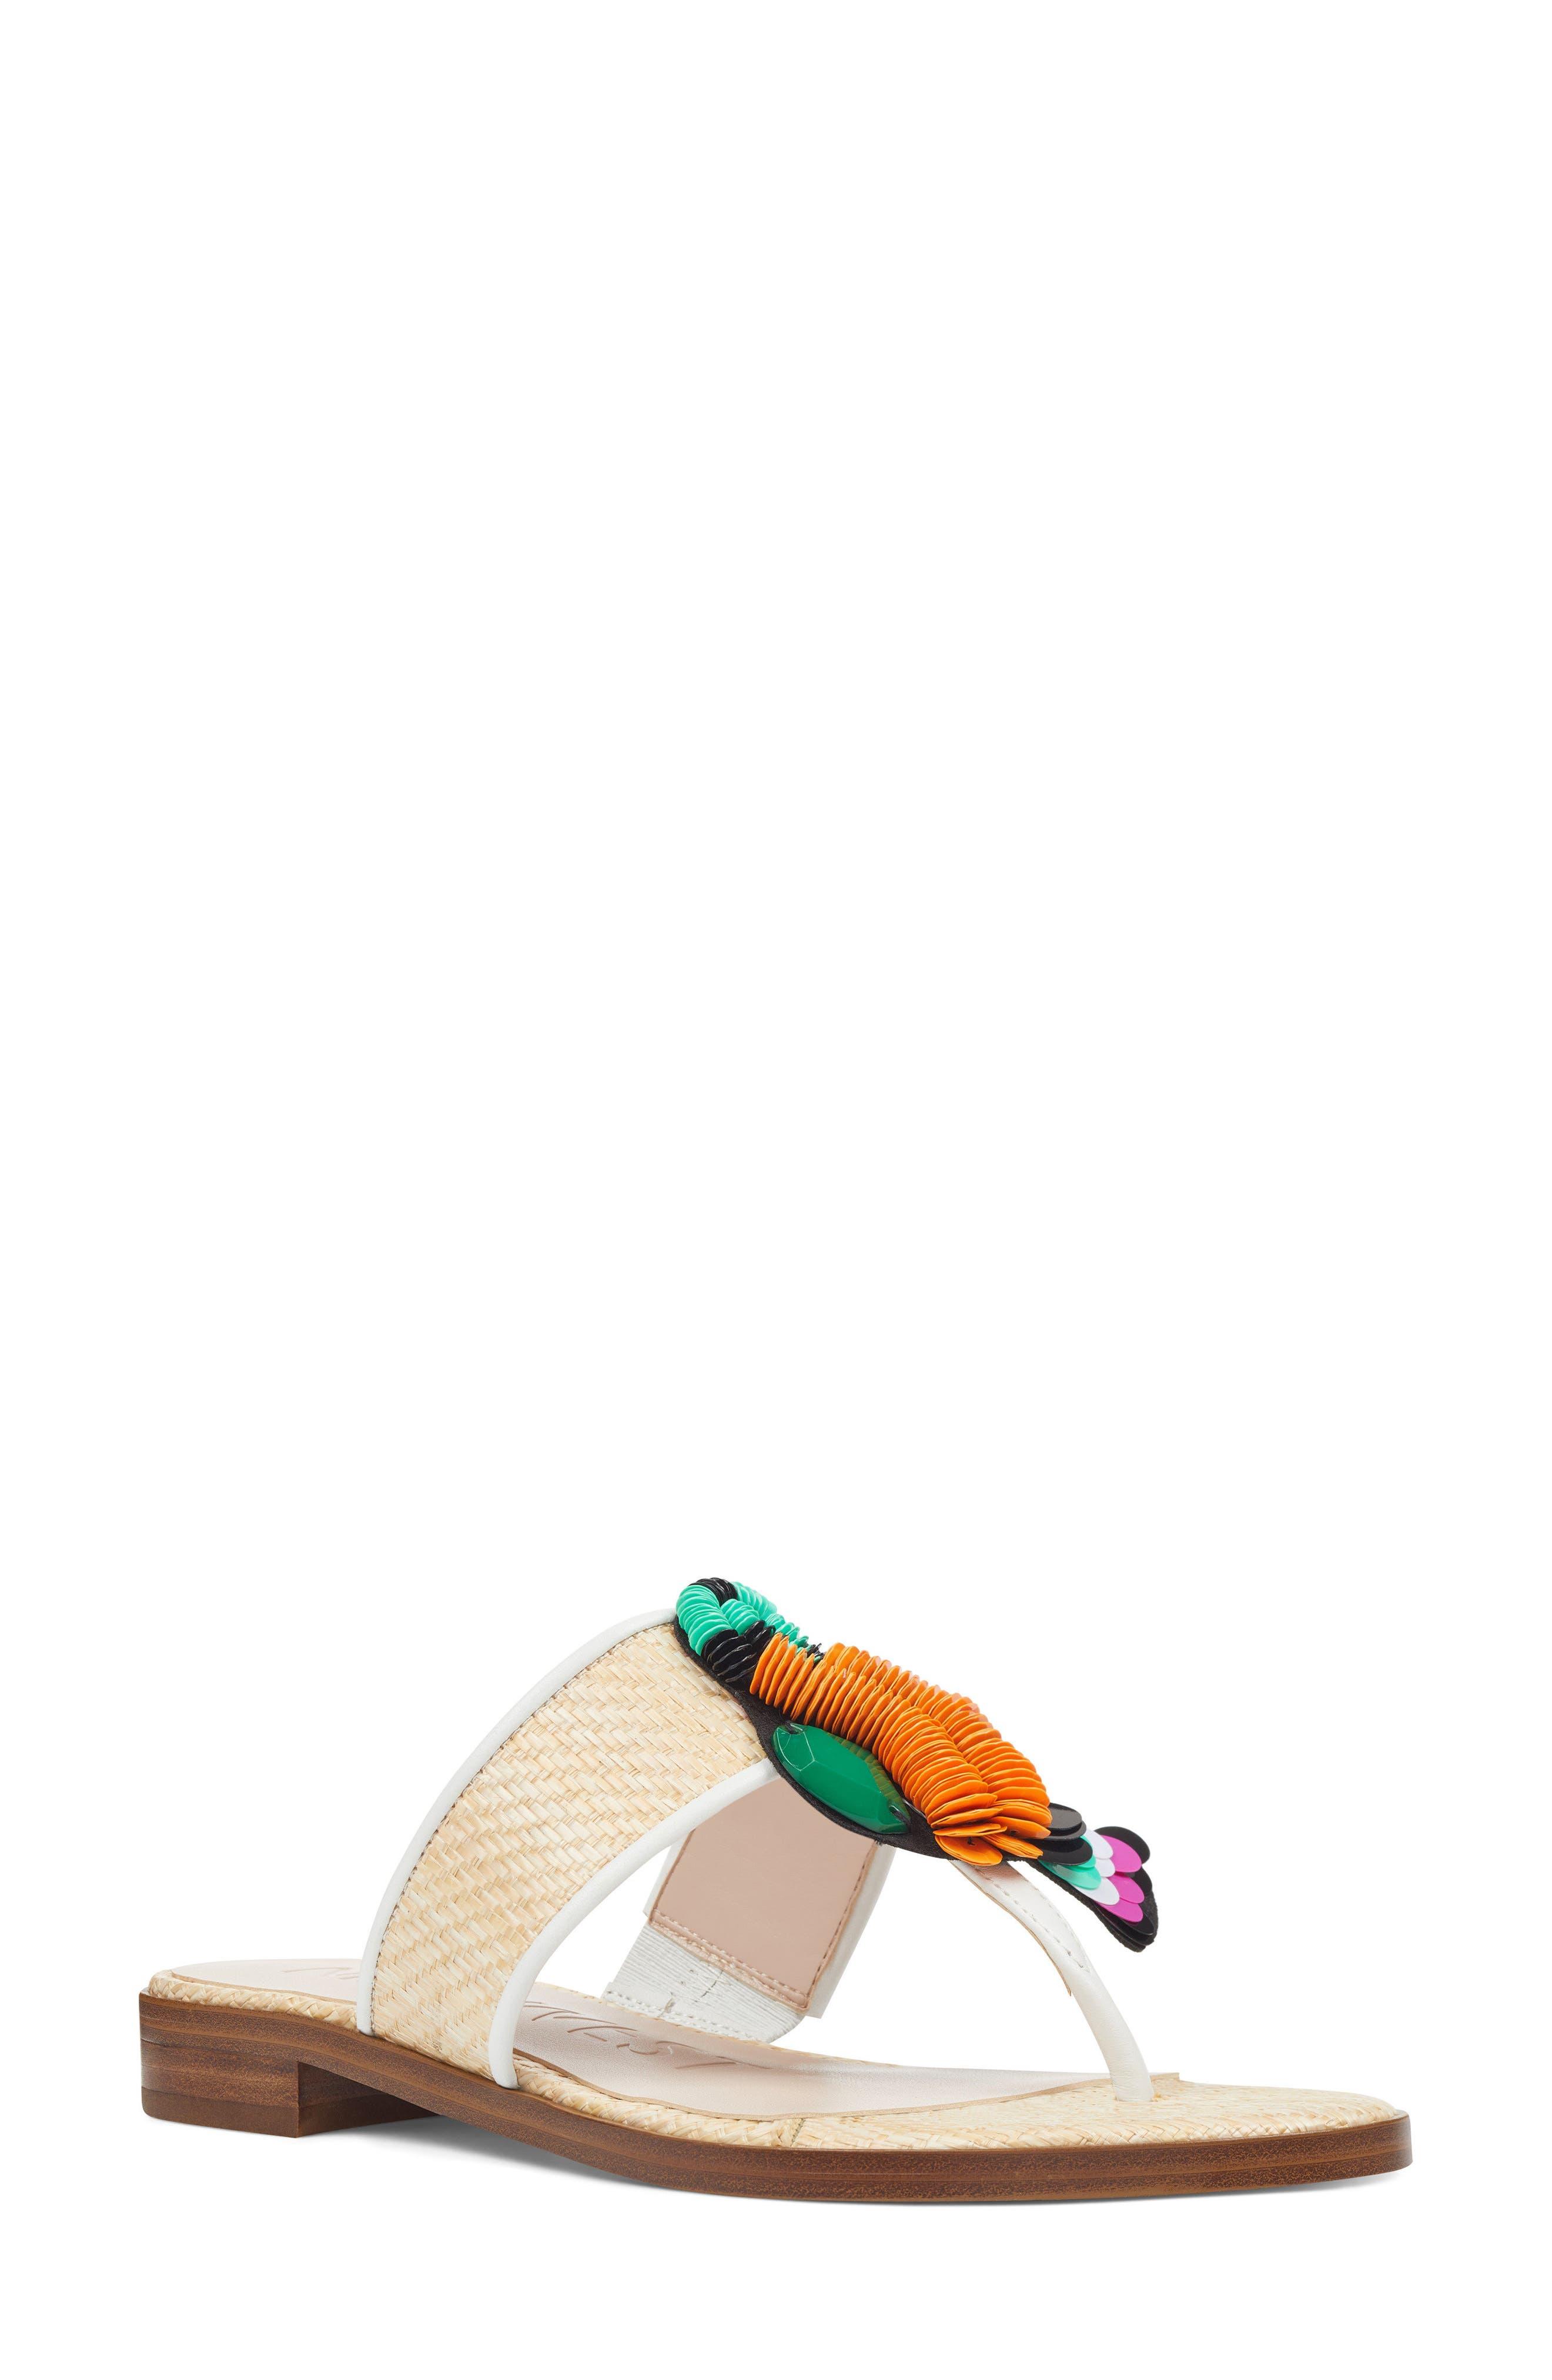 Roseriver Sandal,                         Main,                         color, NATURAL/ WHITE FABRIC